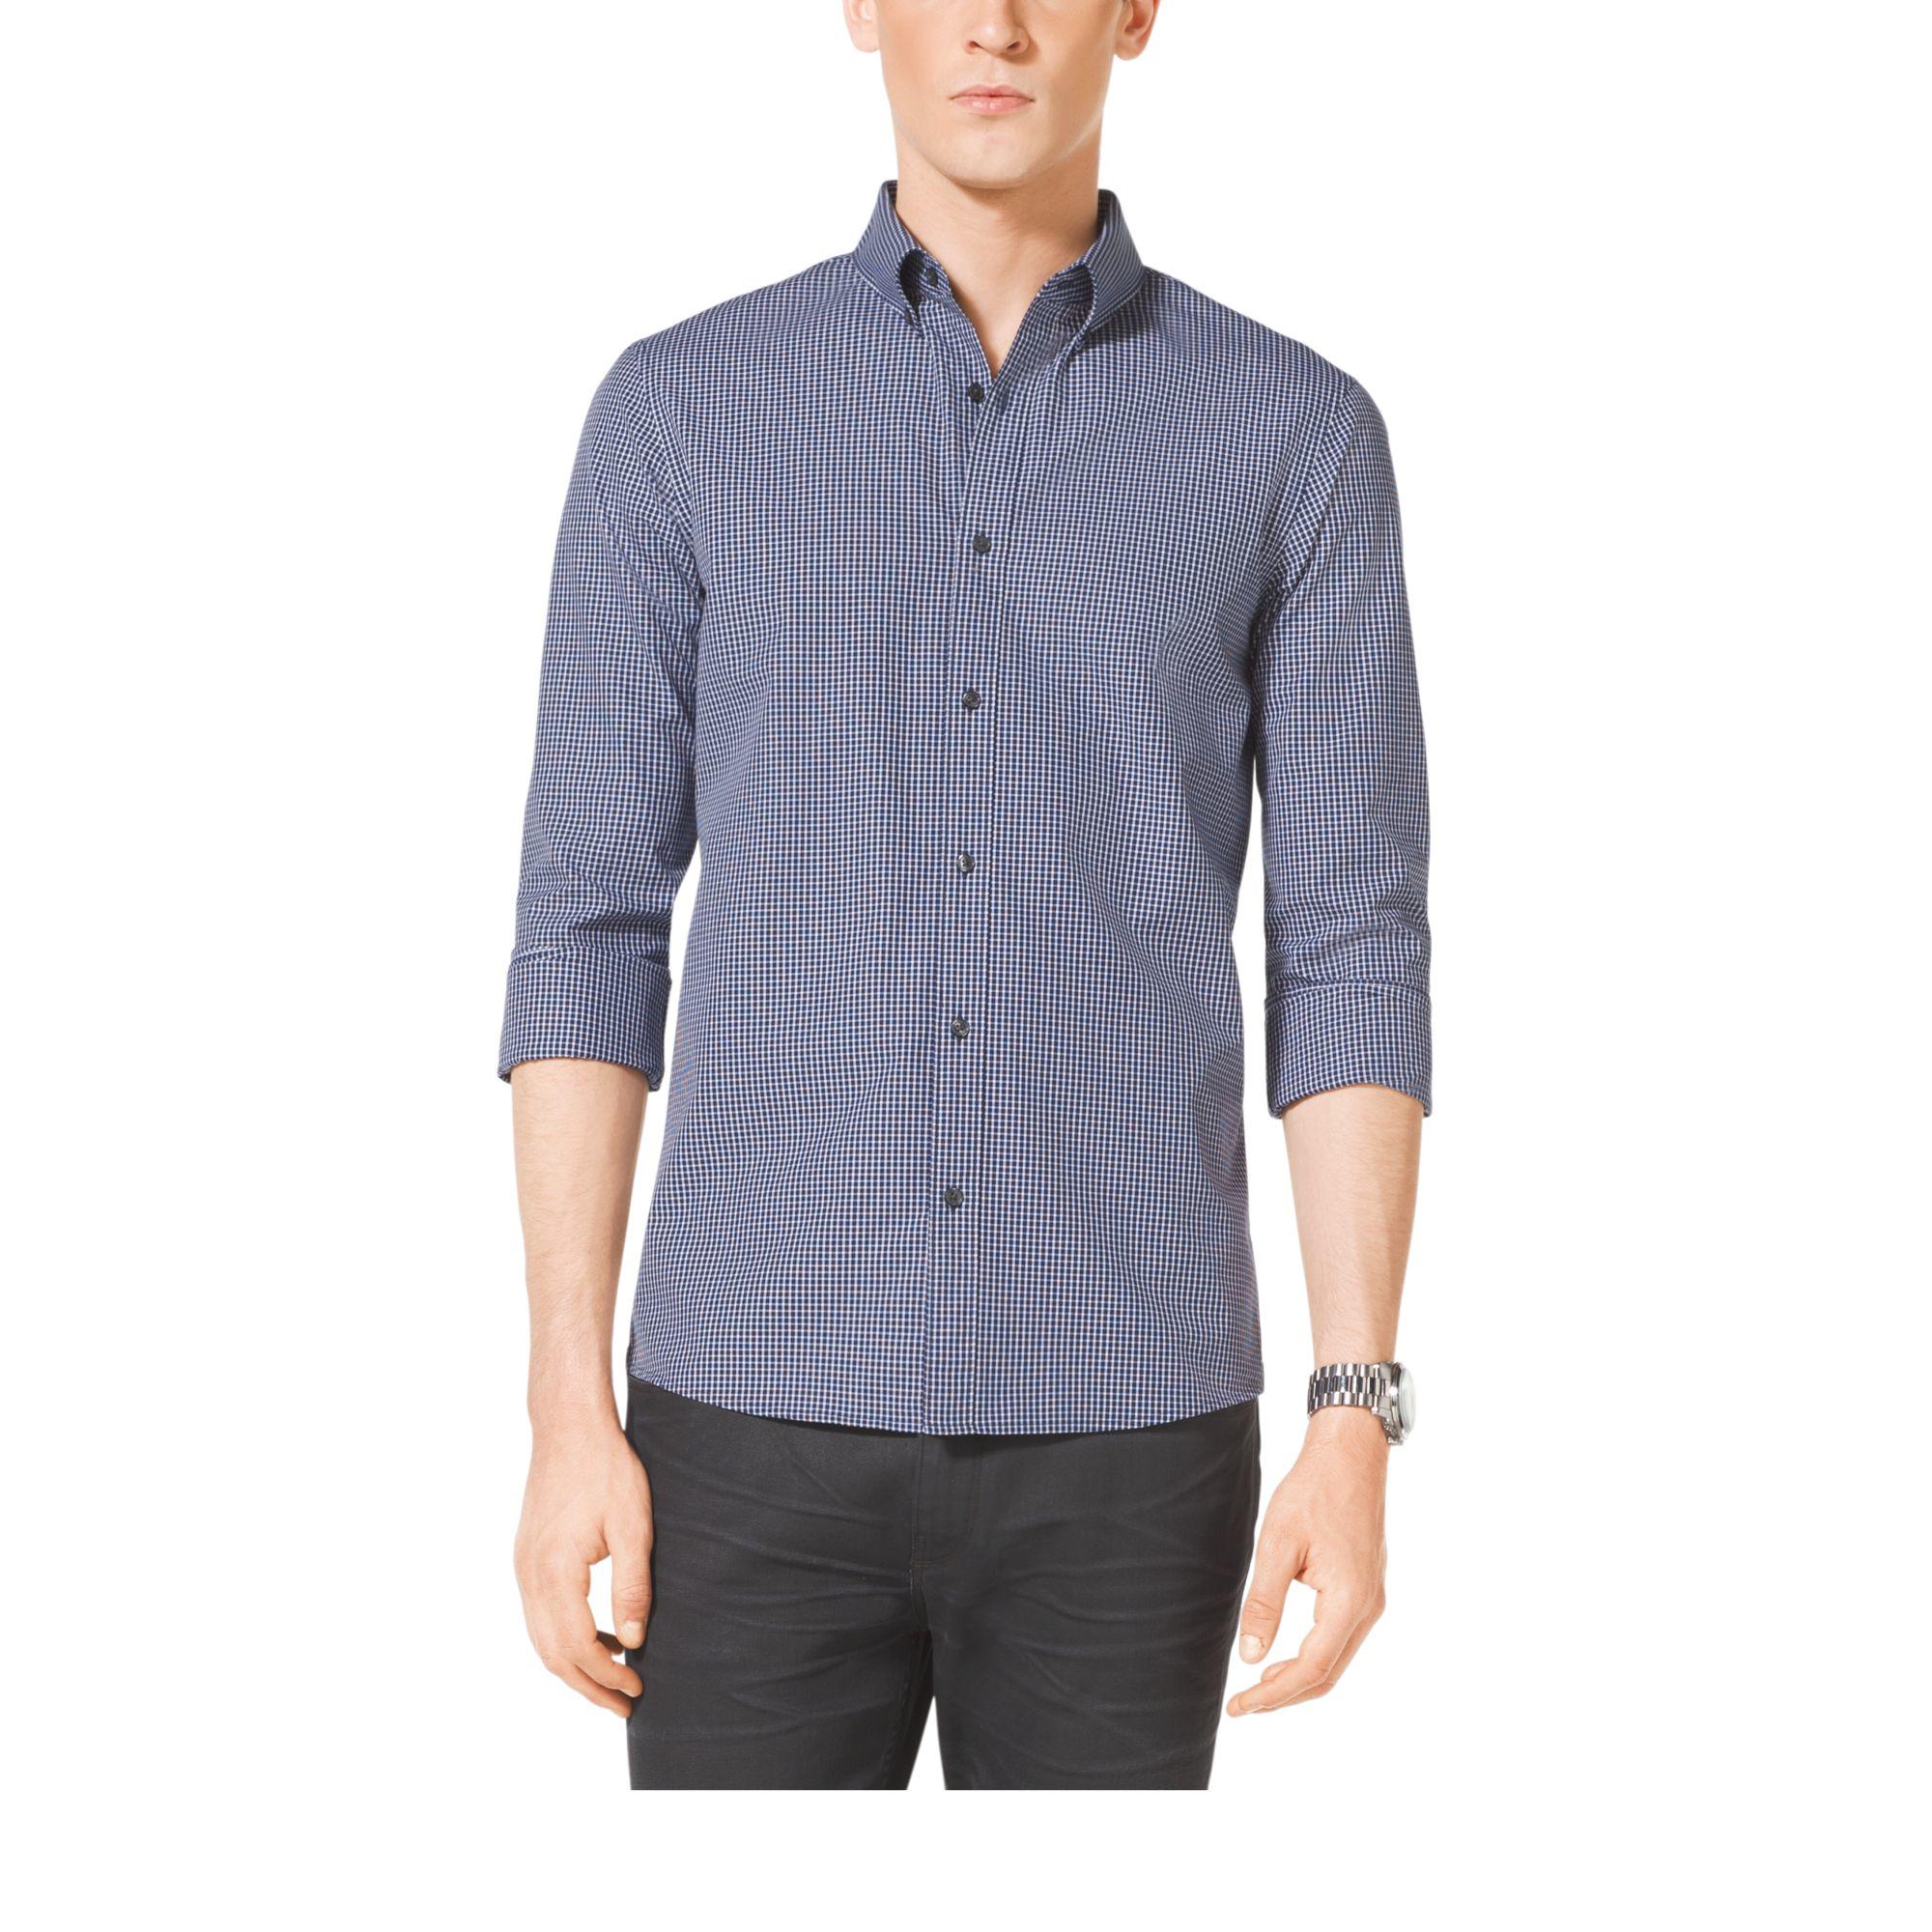 Lyst michael kors slim fit cotton shirt in blue for men for Slim fit cotton shirts